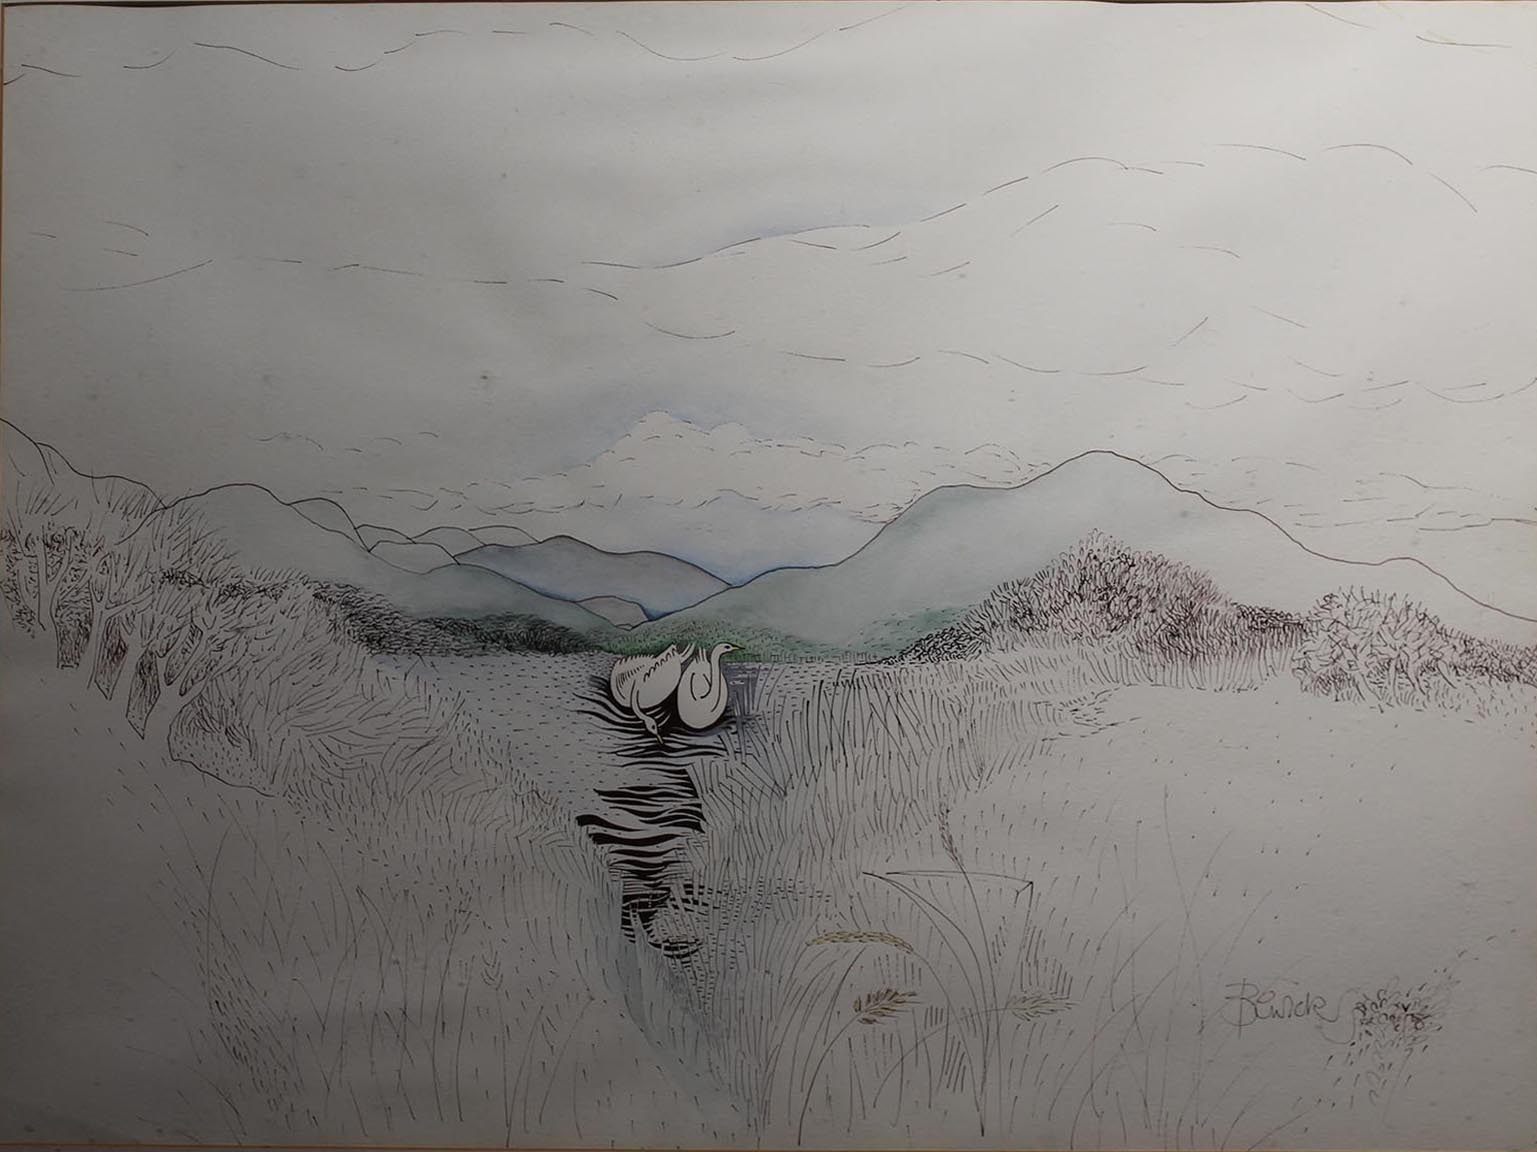 "Lot 12 - Pauline Bewick SWANS, KILLARNEY Pen & Wtercolour, 22"" x 30"" (55.9 x 76.2 cm), signed, inscribed"